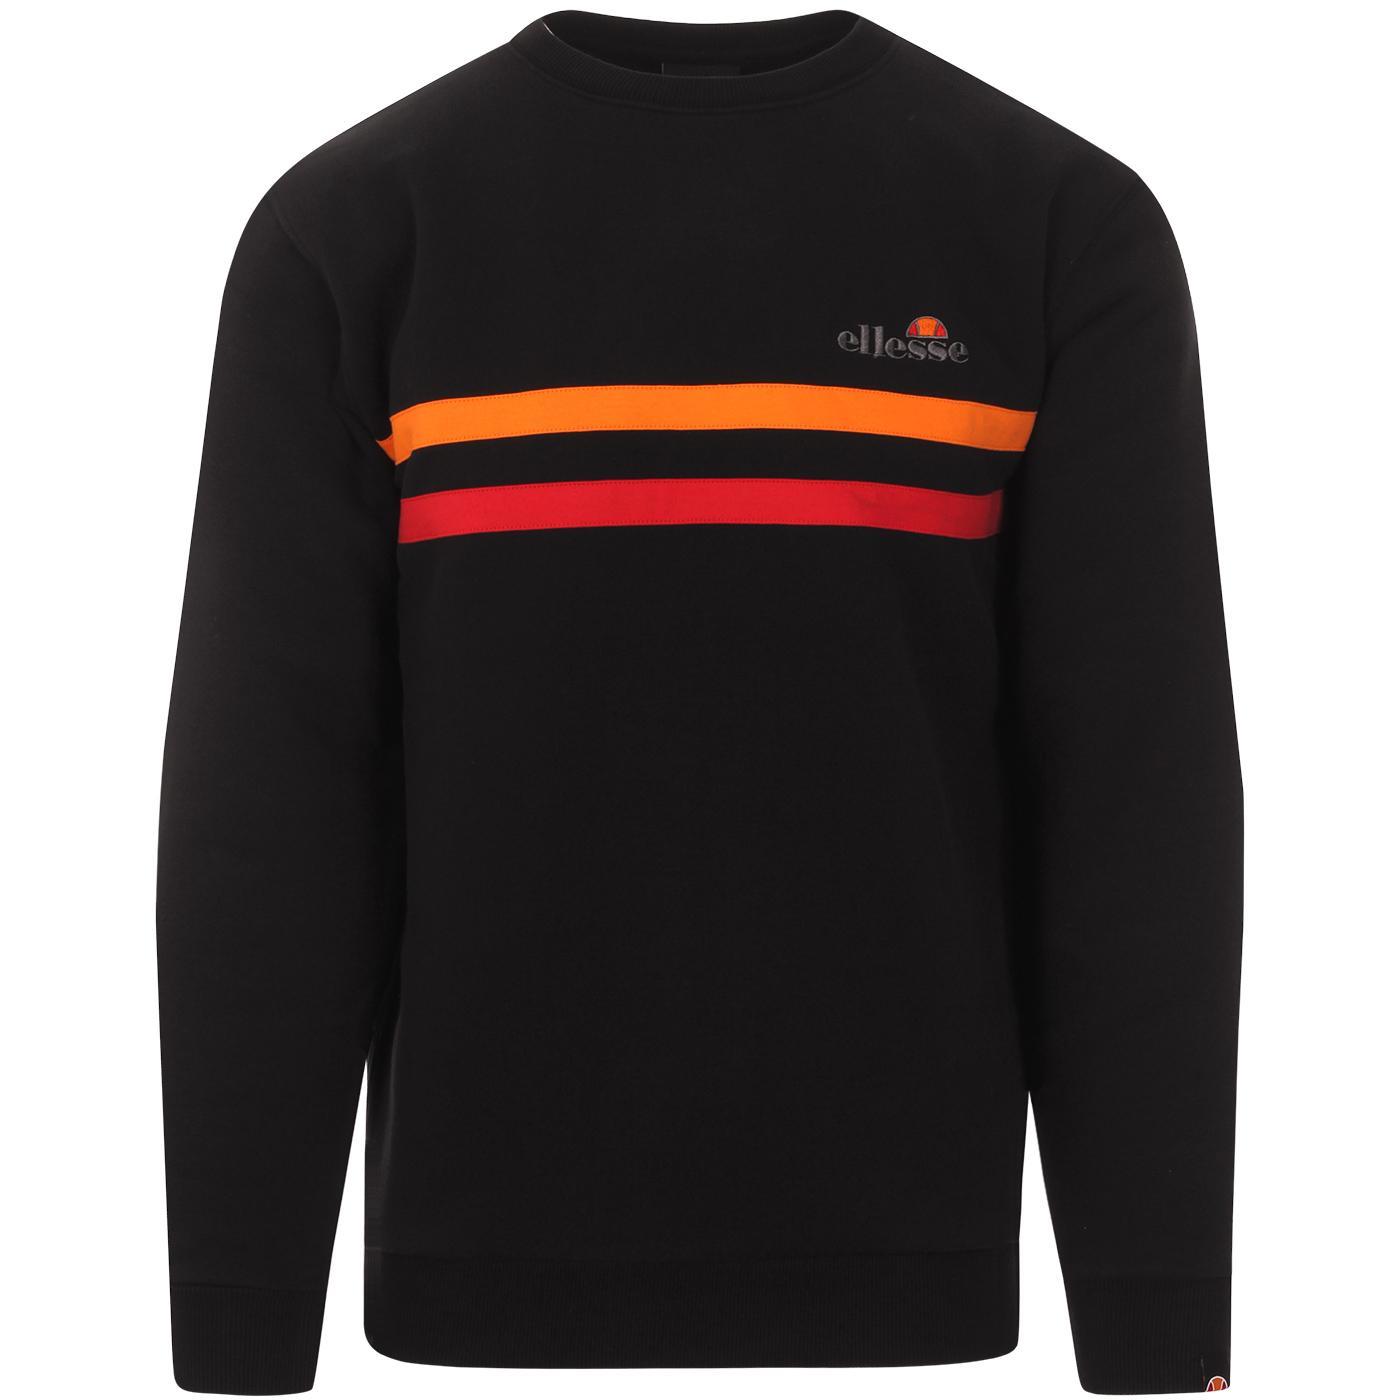 Erminion ELLESSE Retro 90s Stripe Sweatshirt (BRG)